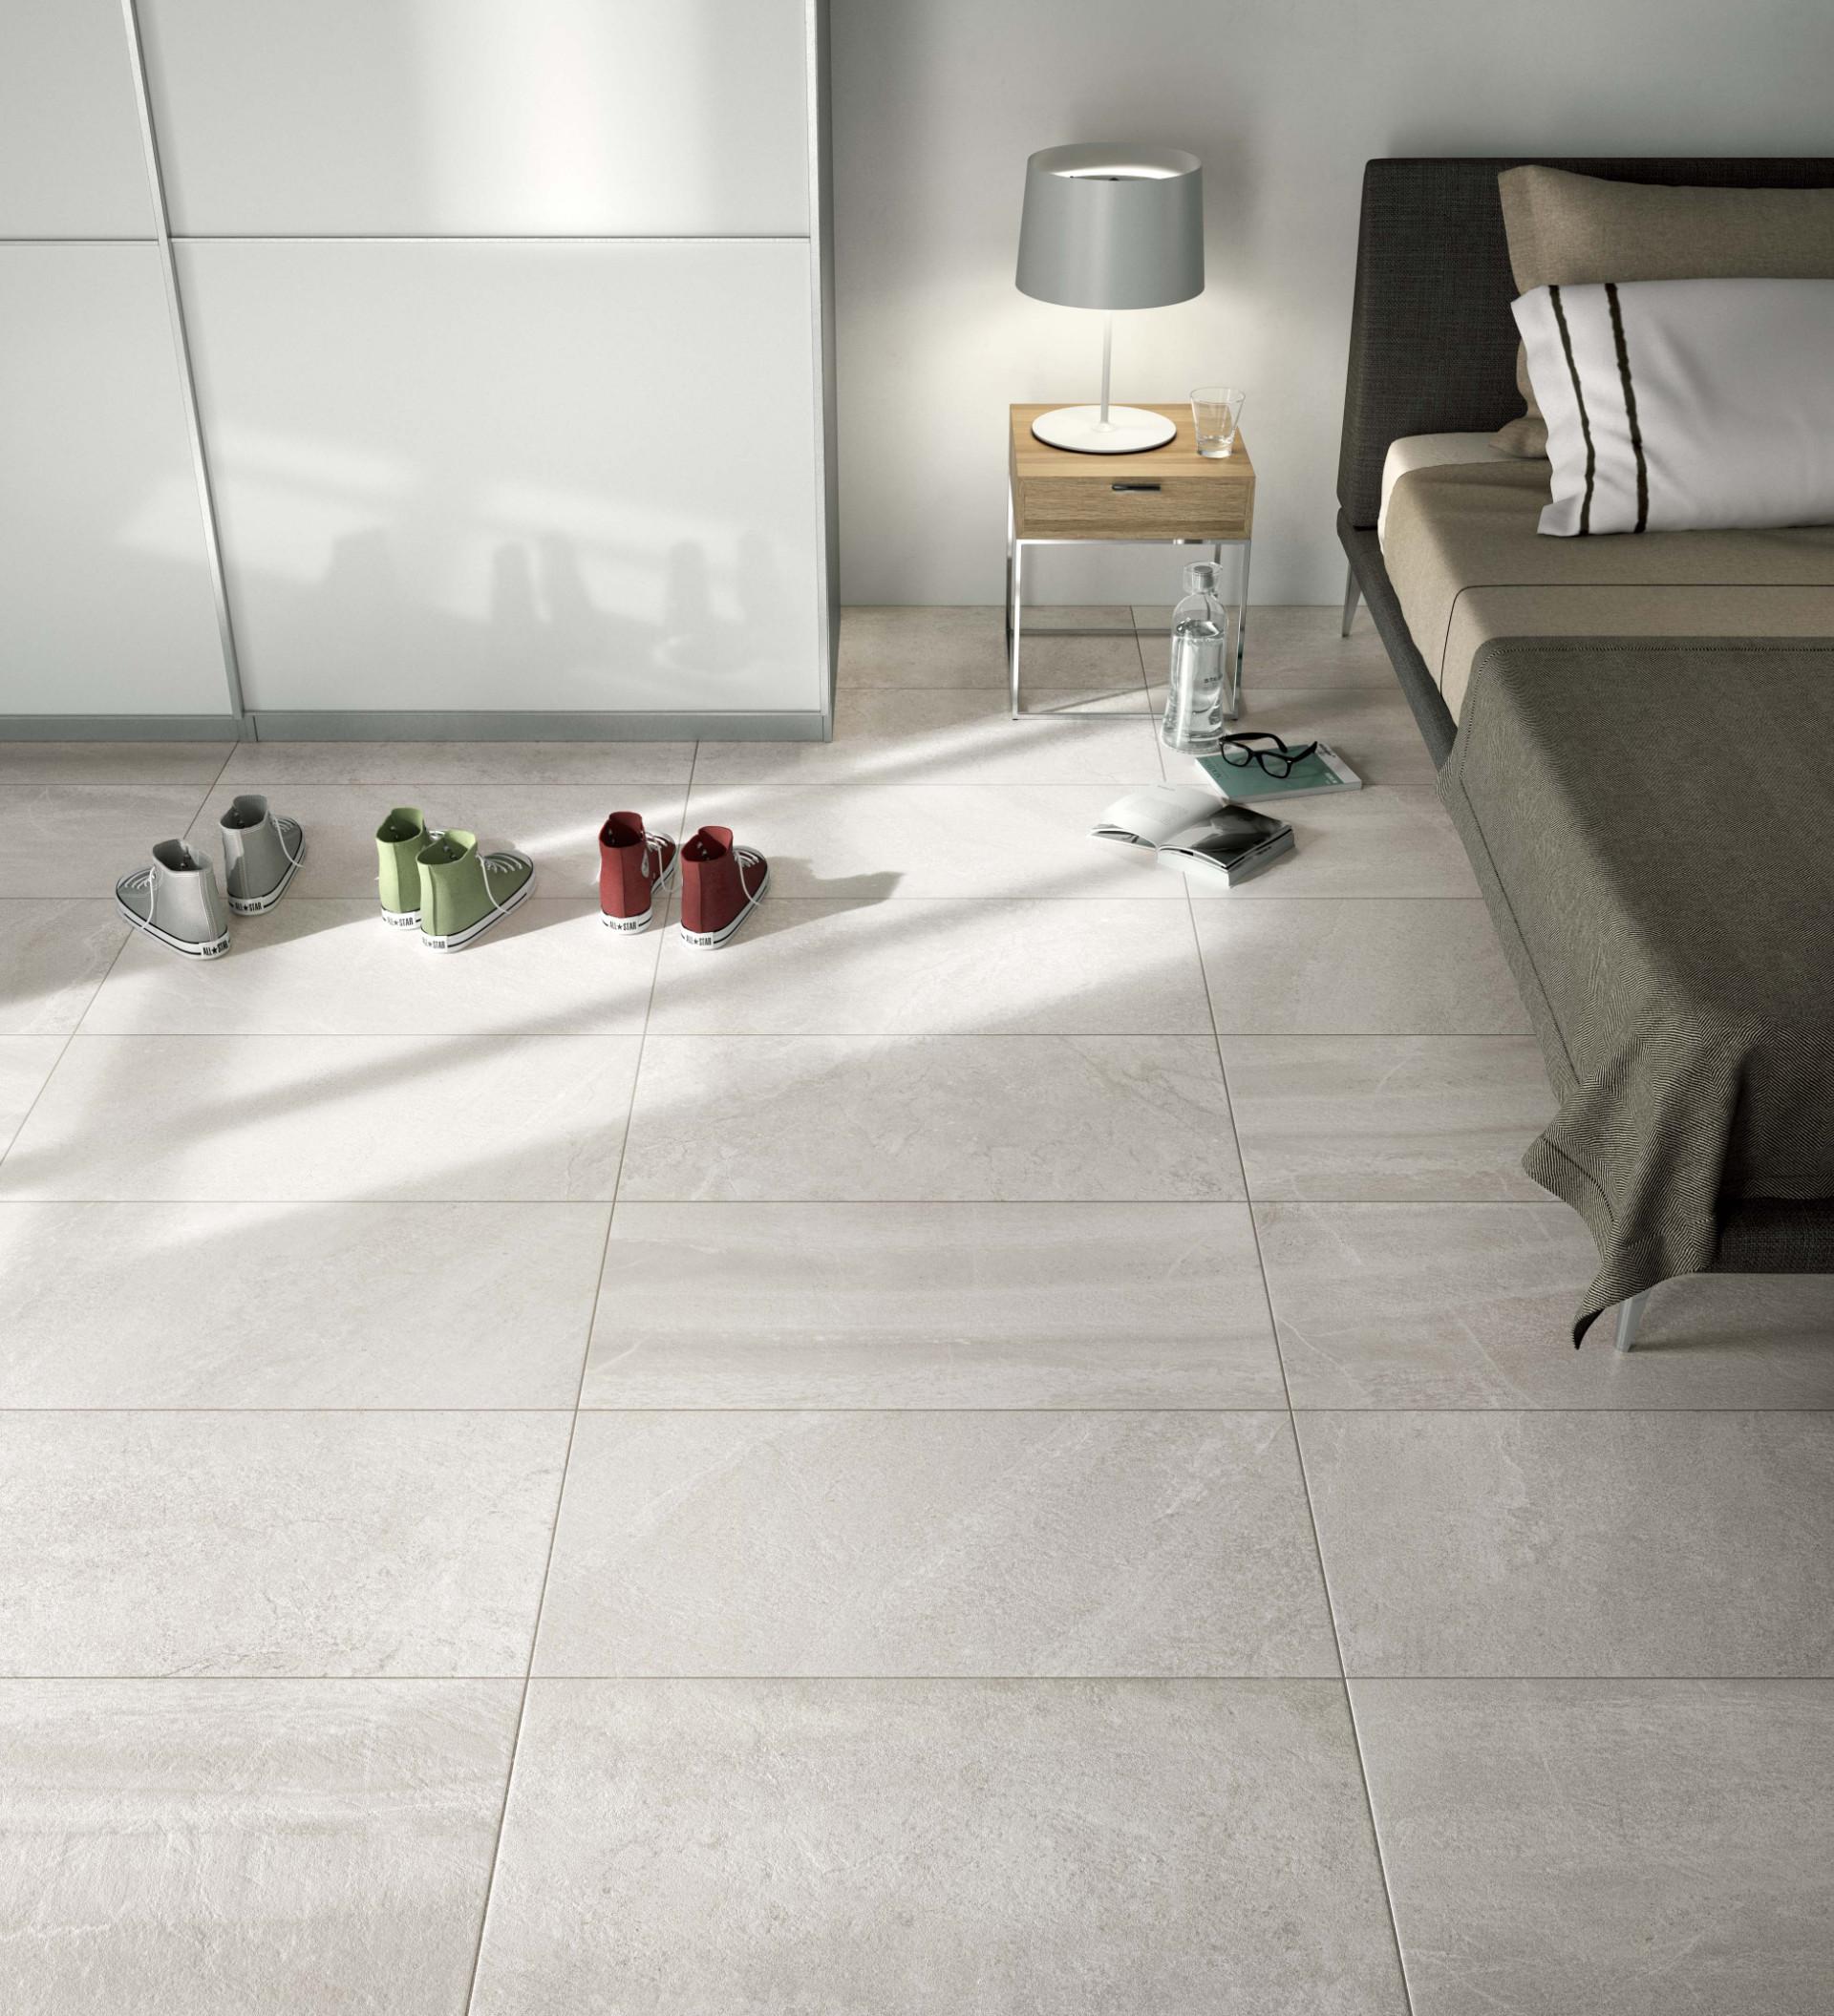 Slate Effect Tile - Forward - Natural Stone Nick Firth Tiles